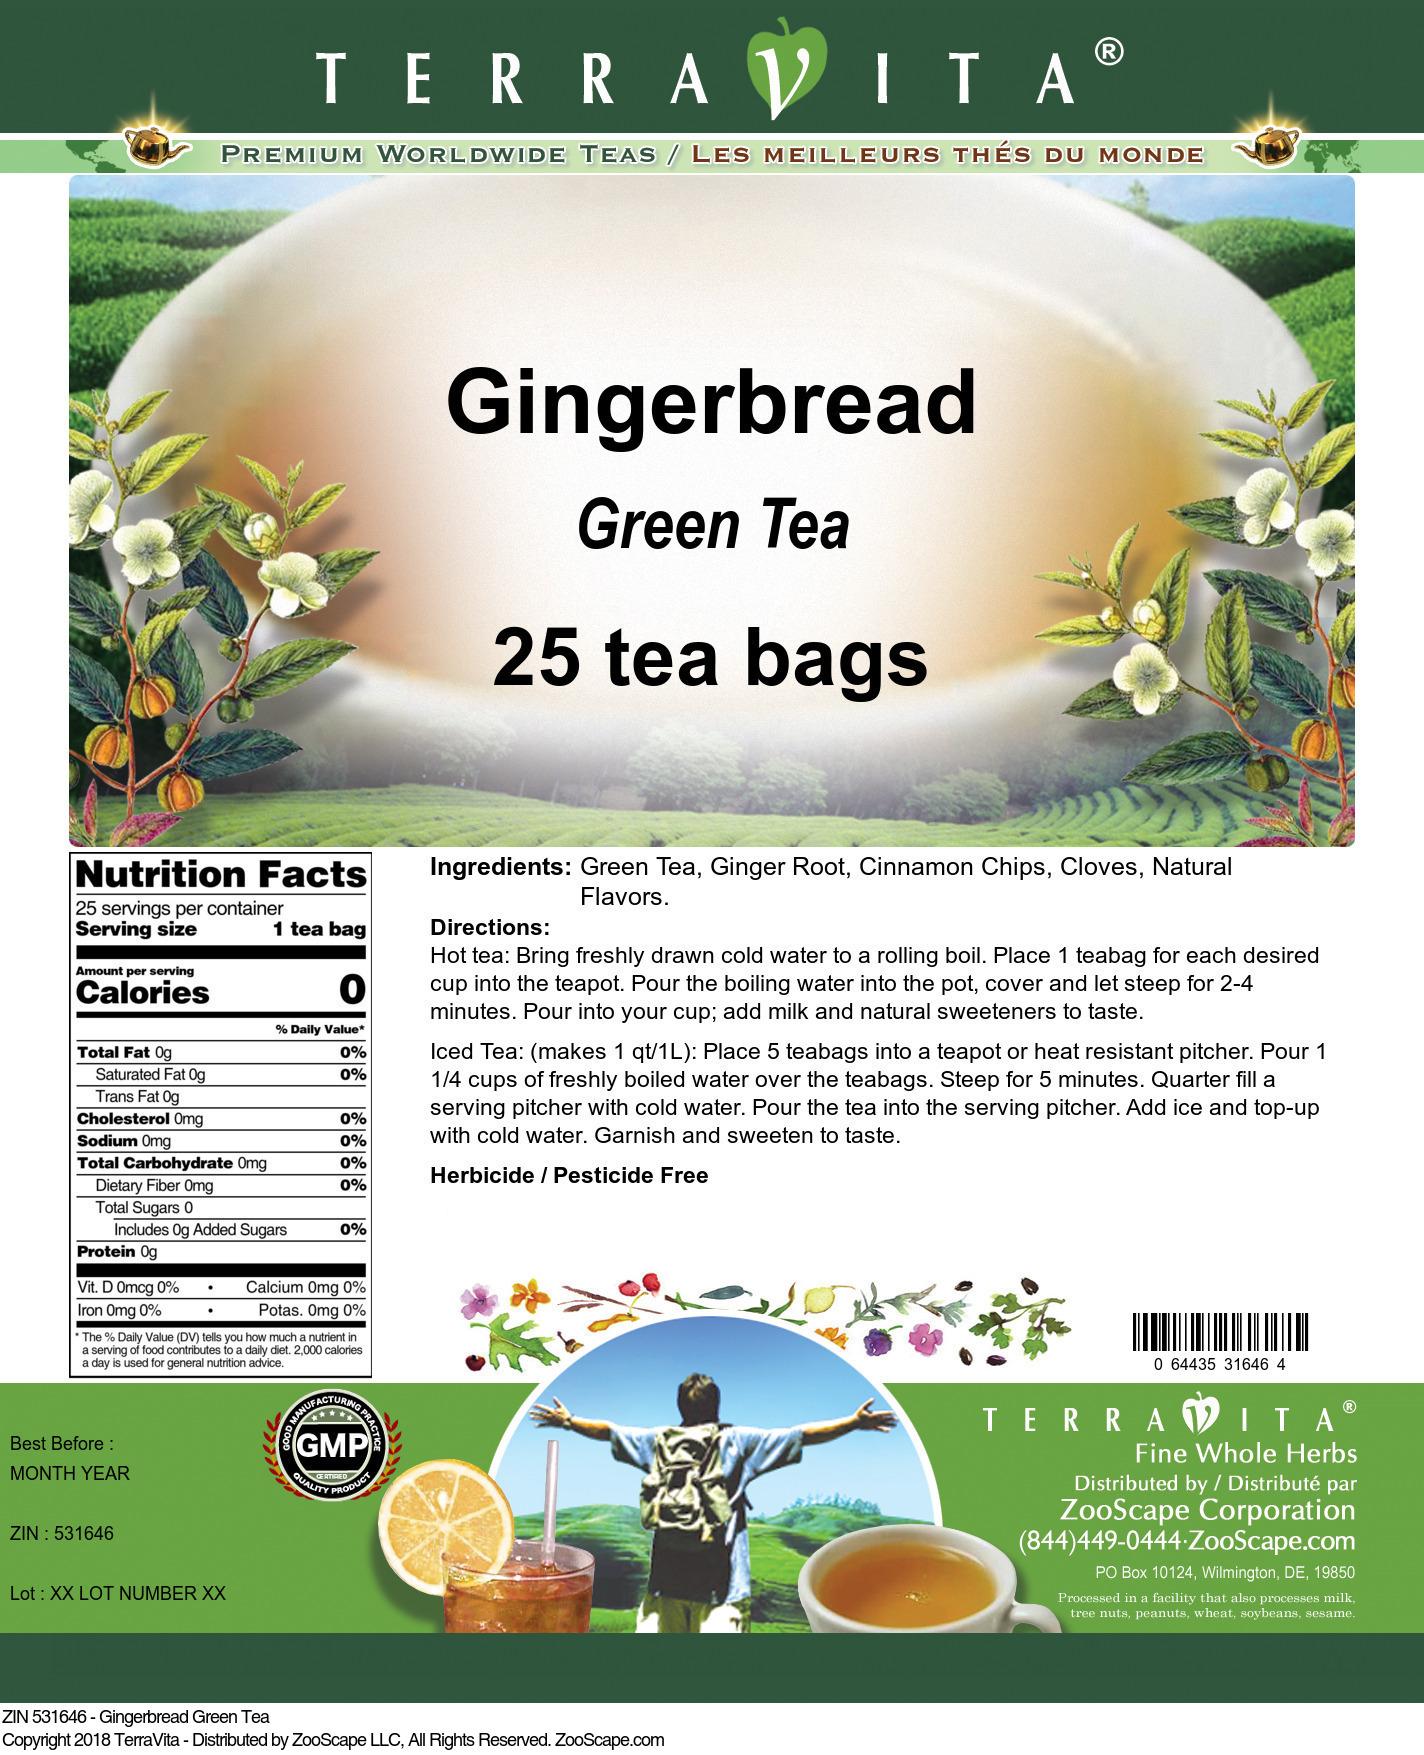 Gingerbread Green Tea